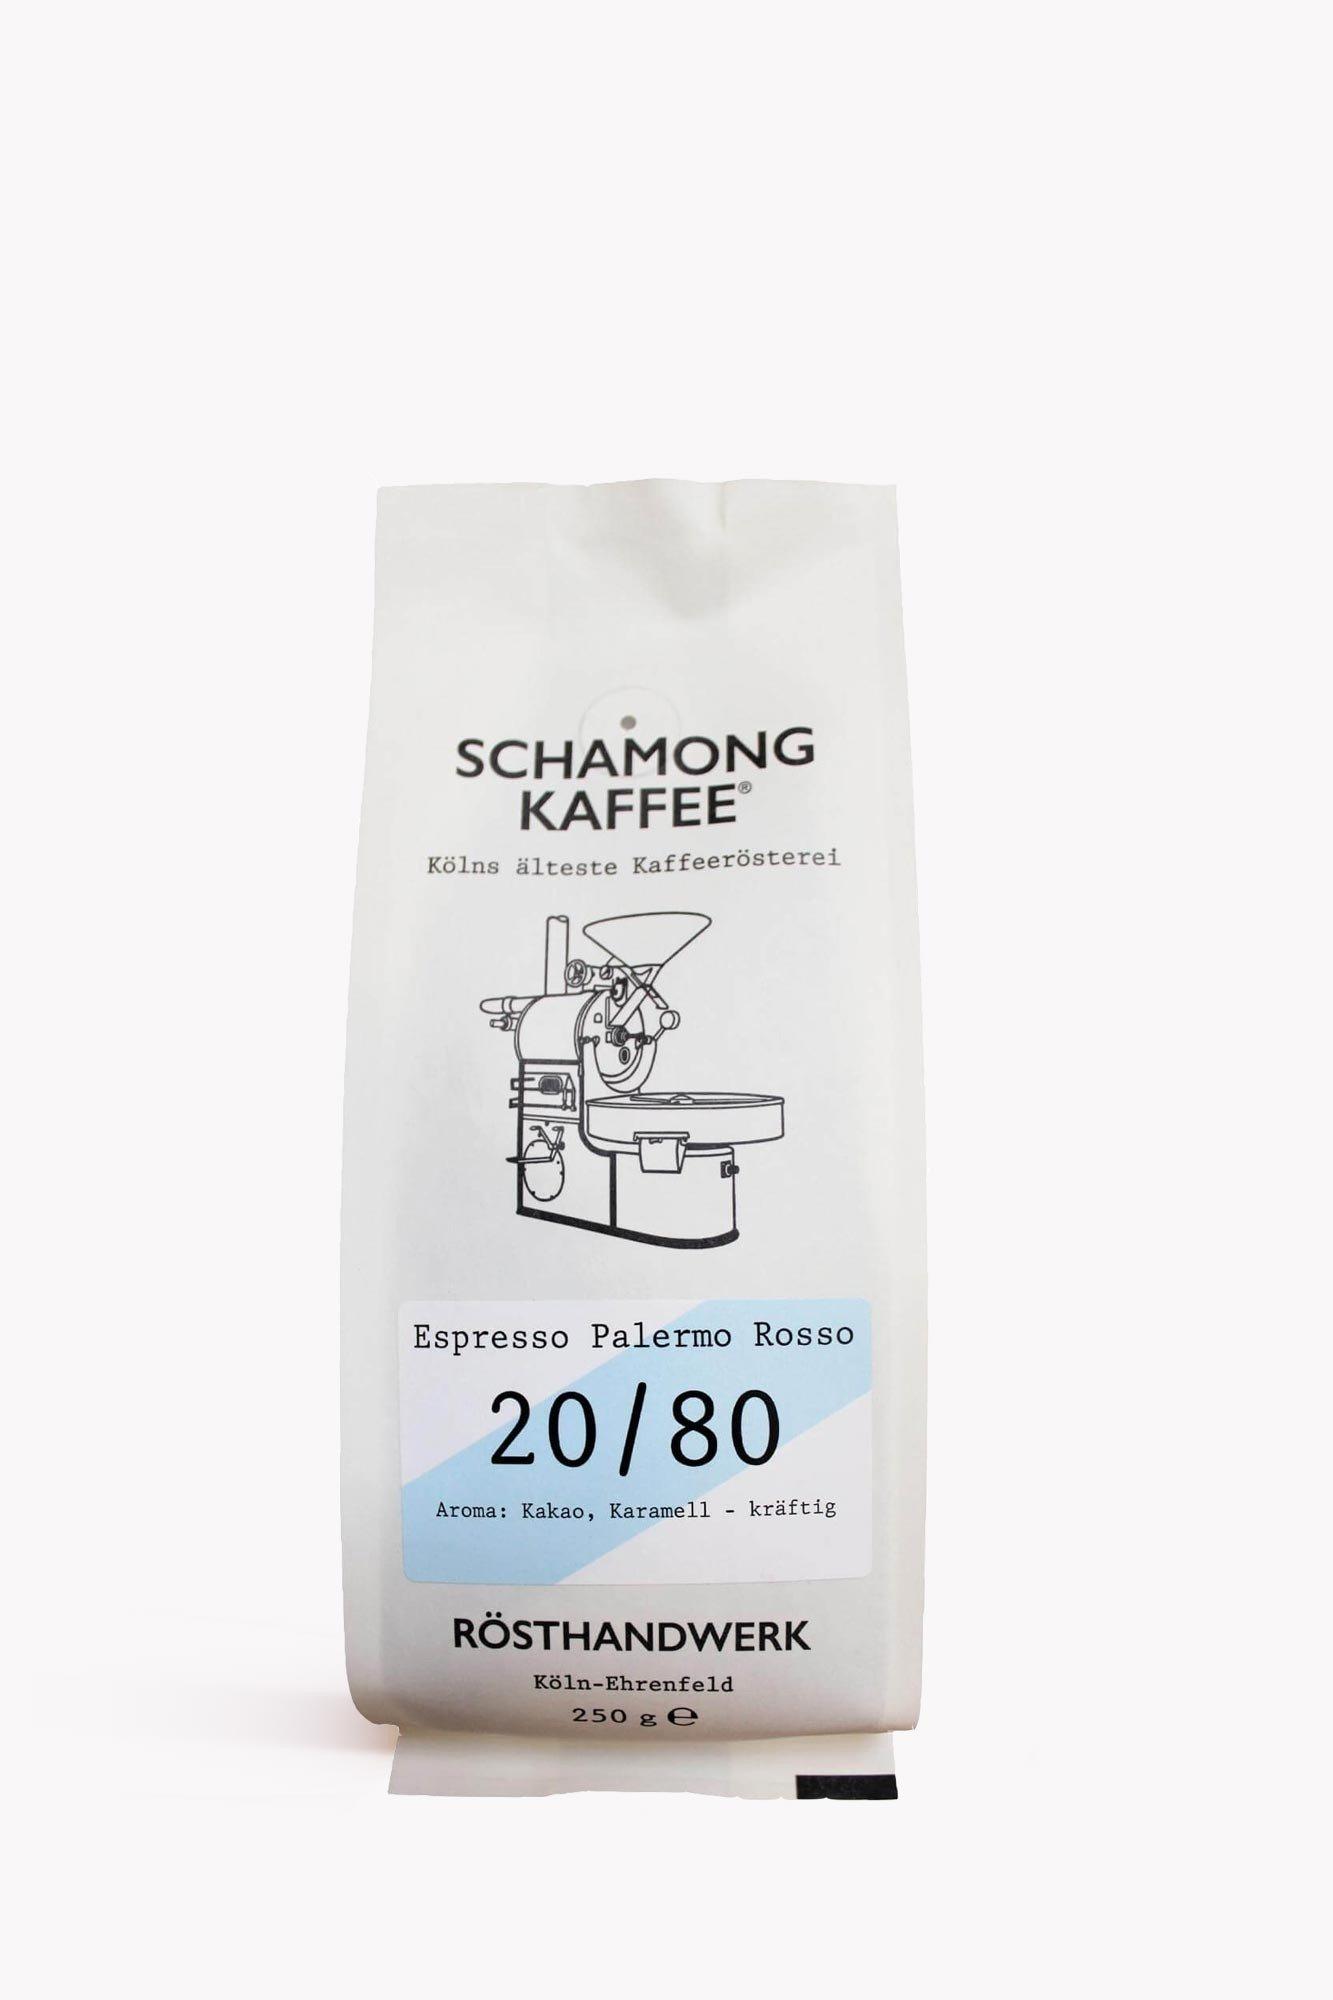 Schamong Espresso Palermo Rosso